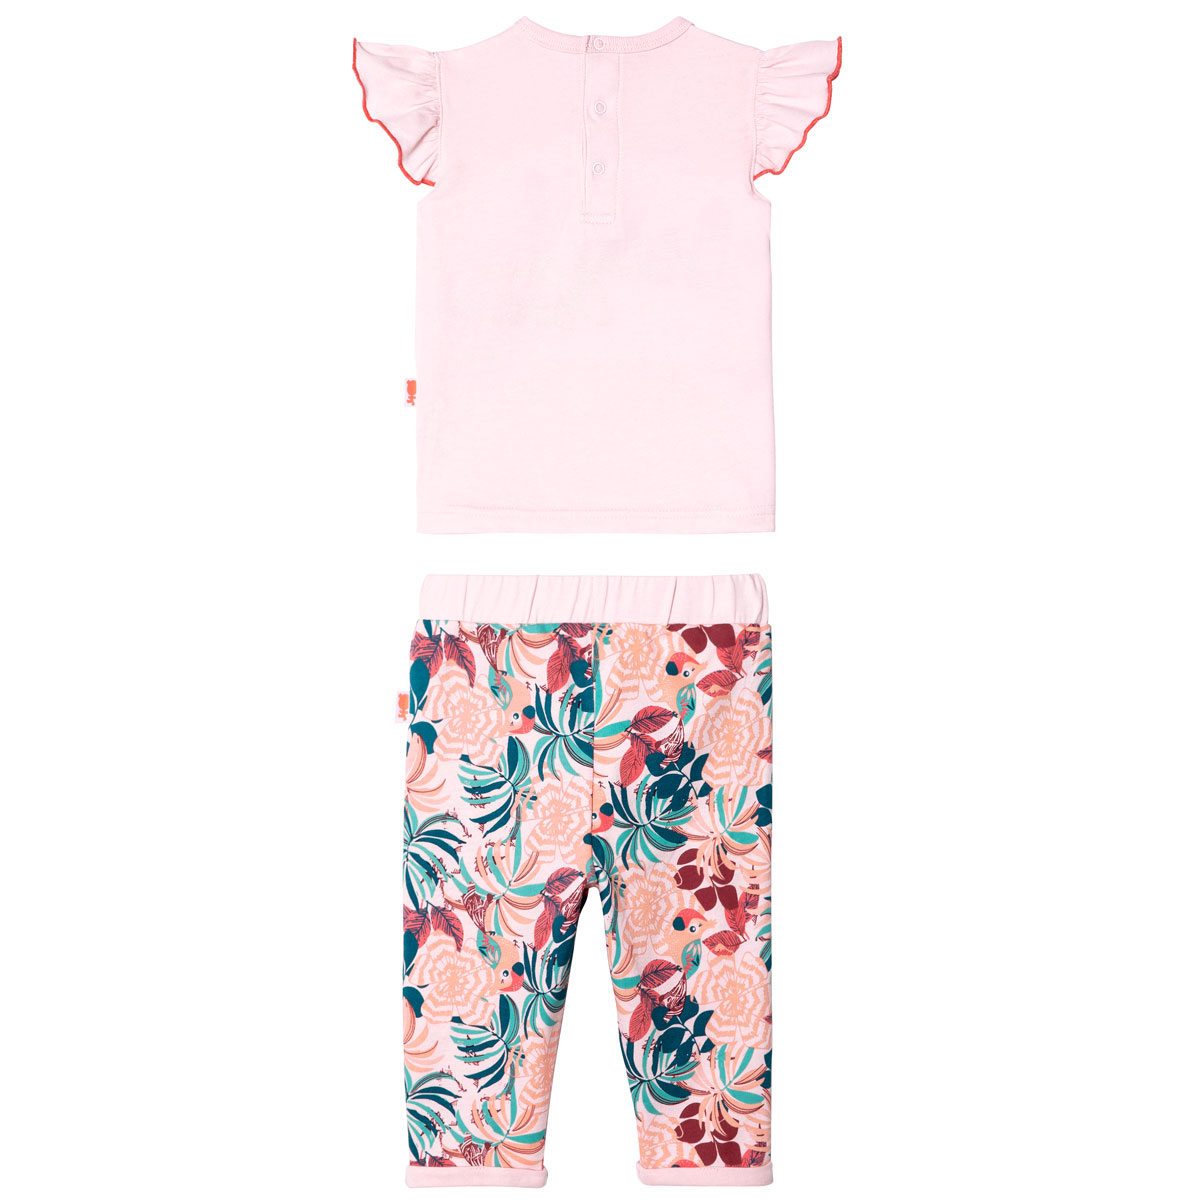 Ensemble bébé fille T-shirt manches courtes + pantalon Brazilia Bird dos